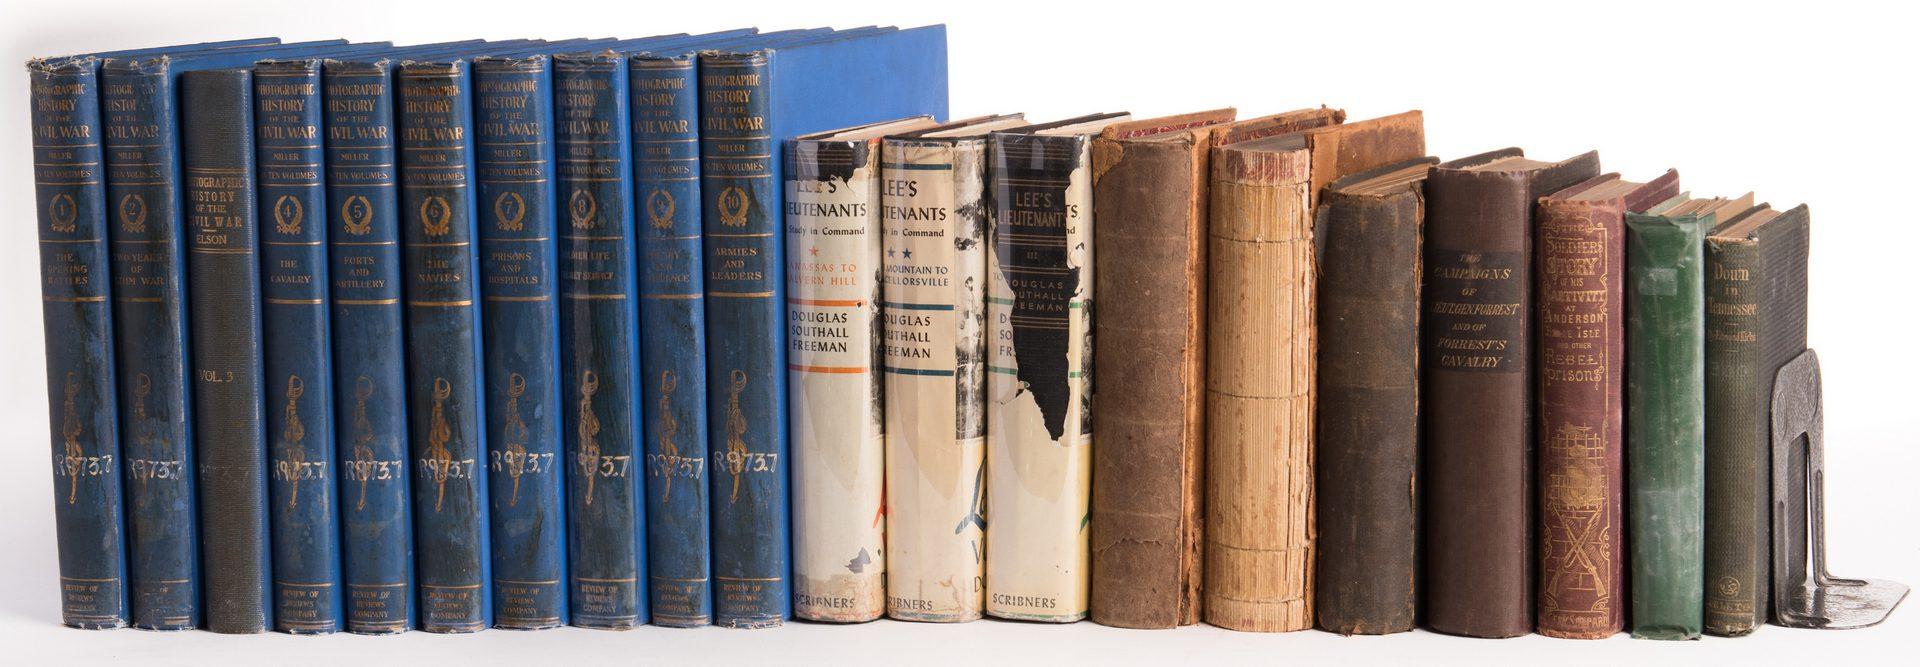 Lot 169: 20 Civil War Related Books